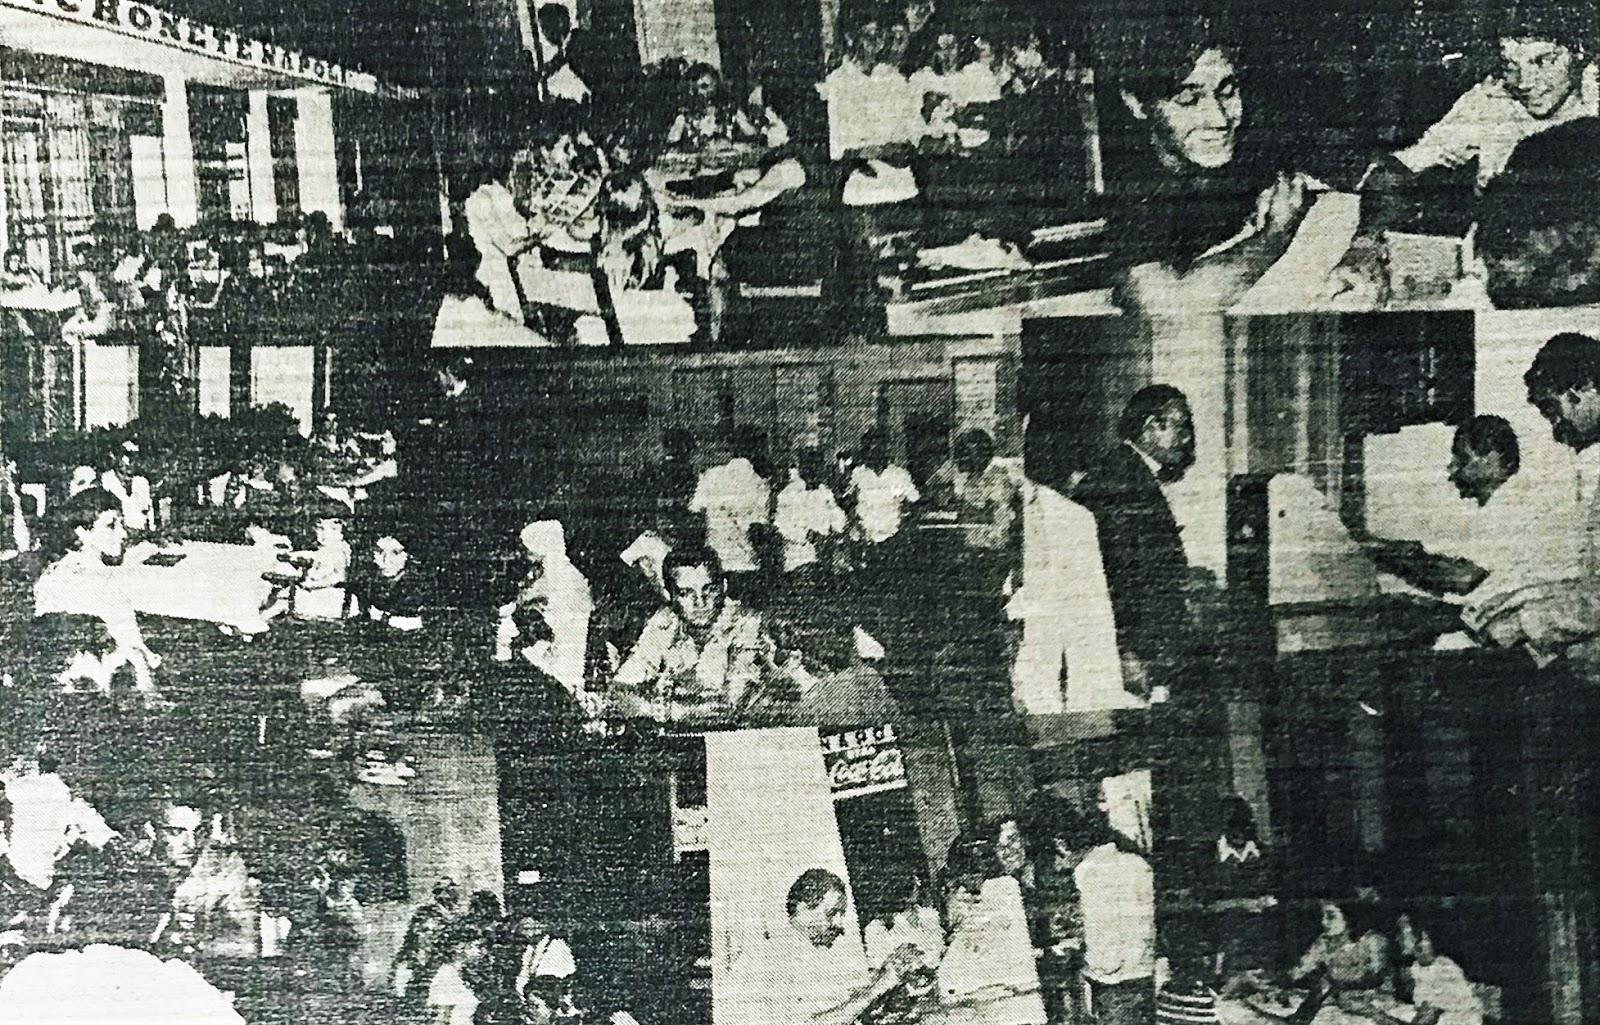 Lanchonete Napoli - 1968